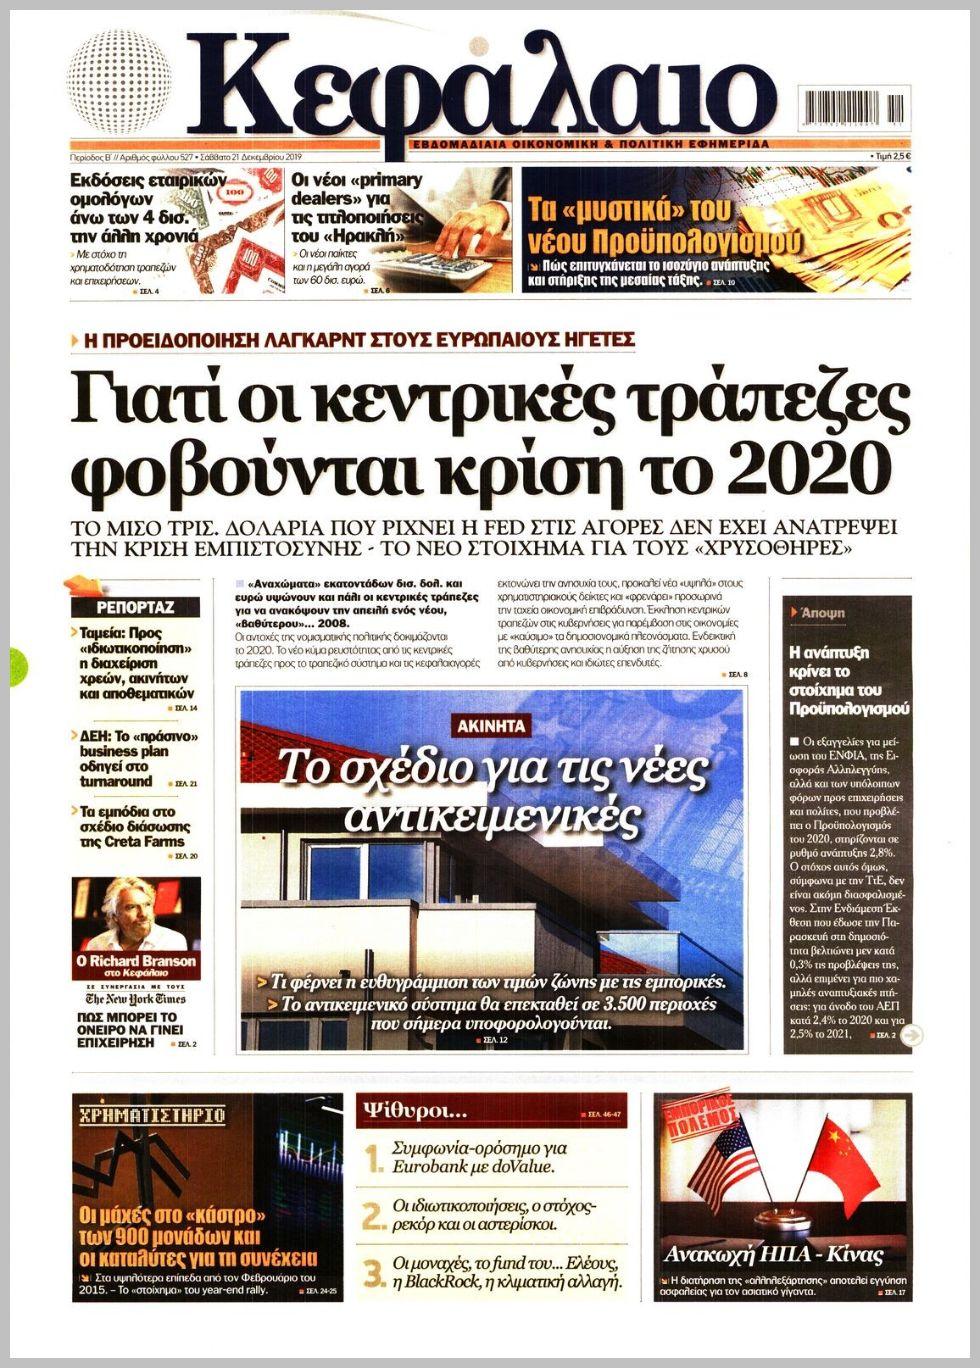 https://protoselida.24media.gr/images/2019/12/21/lrg/20191221_kefalaio_0514.jpg